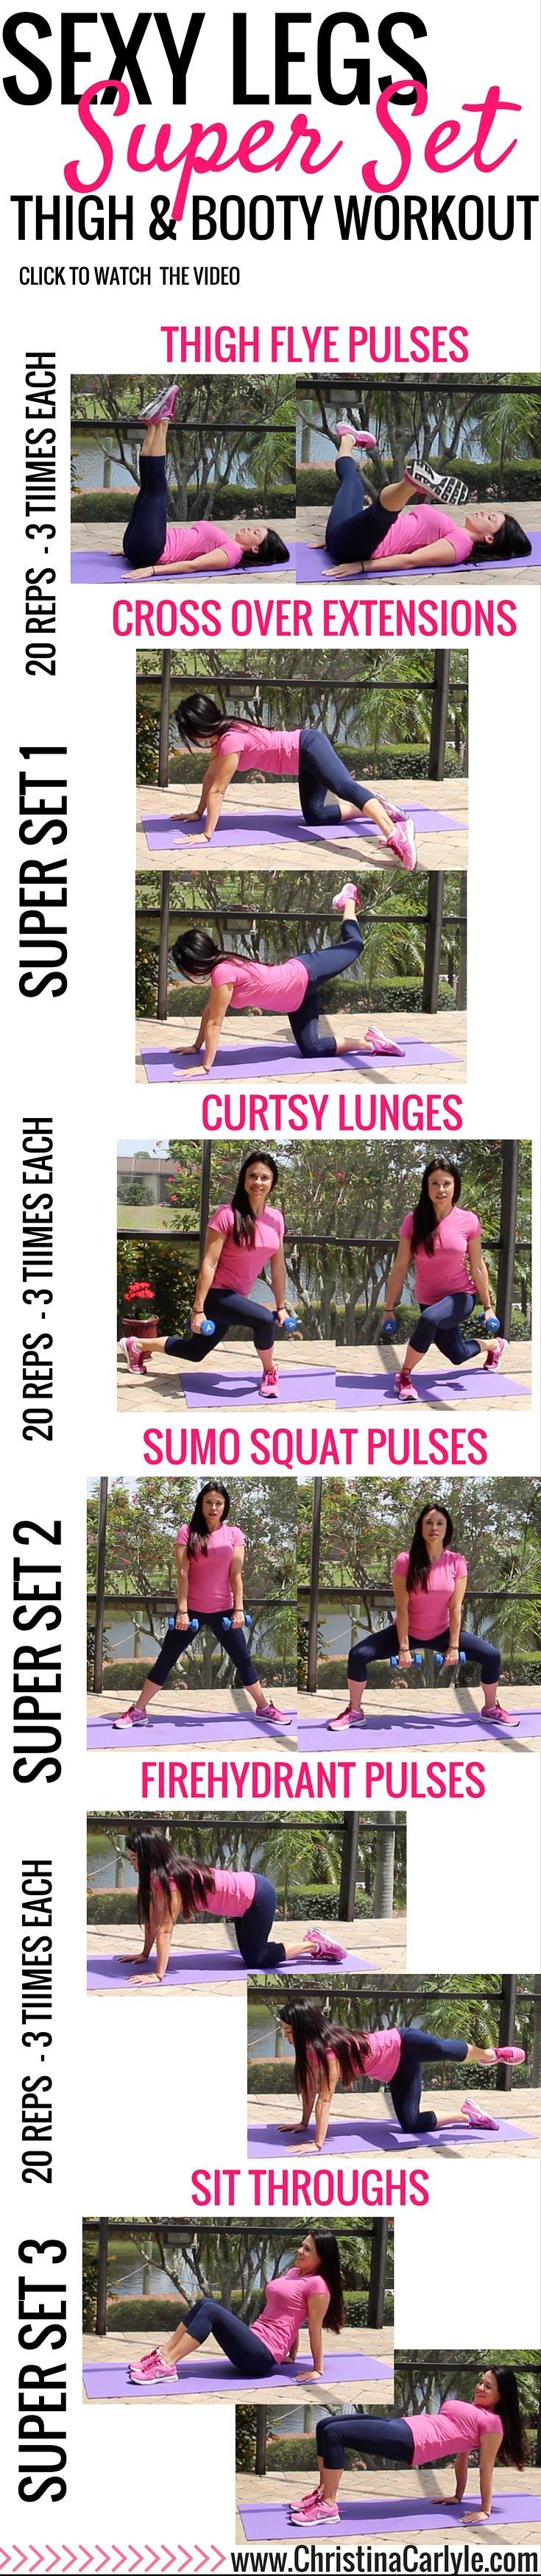 Leg workout for women -